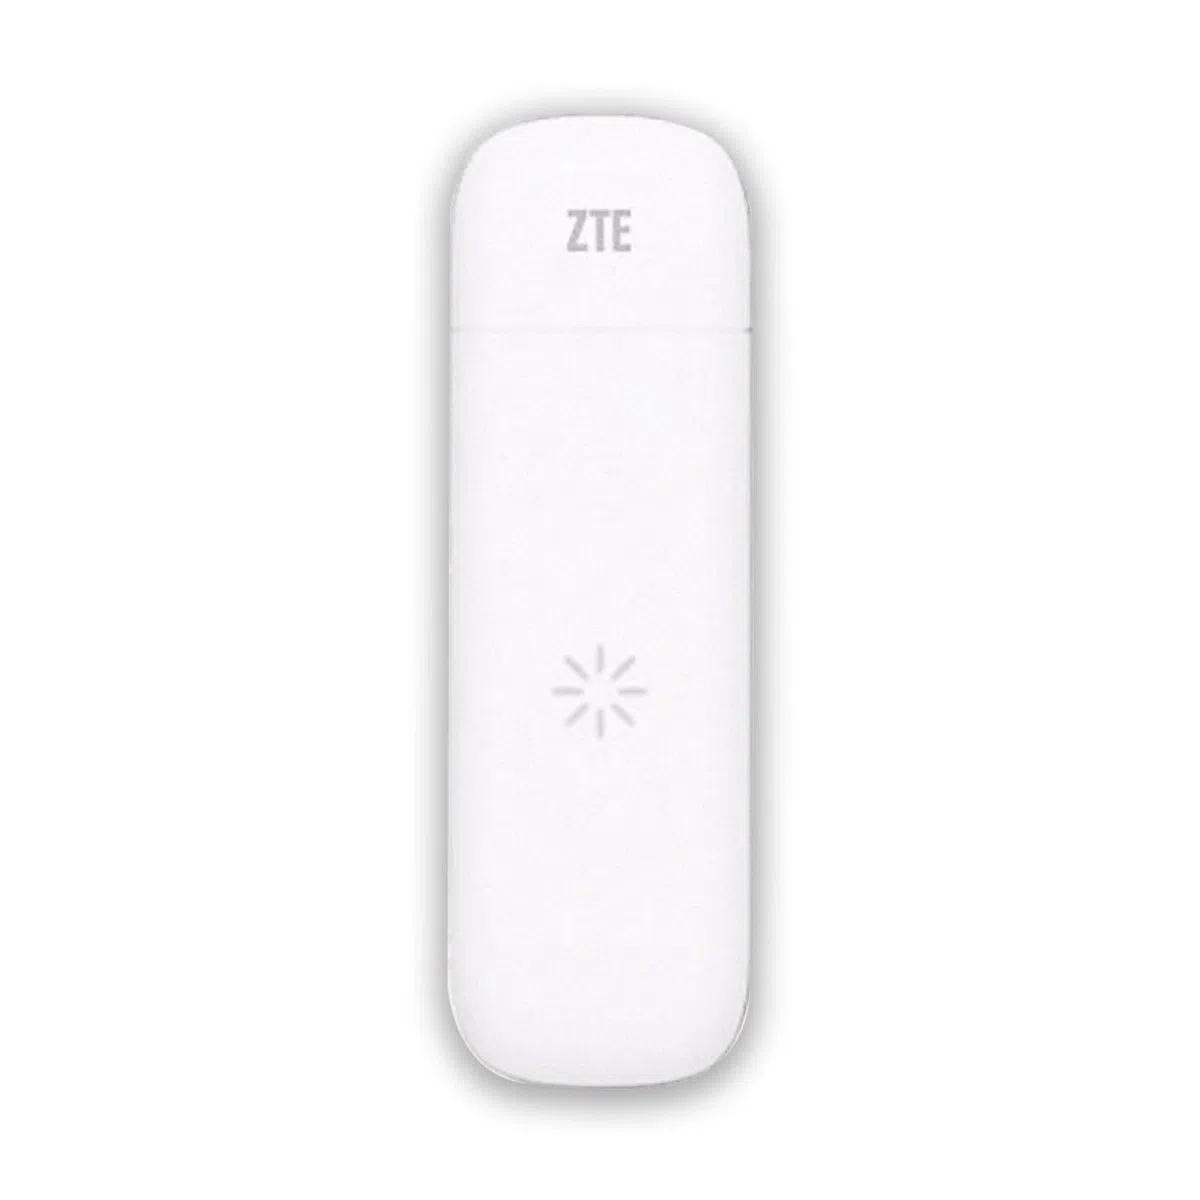 Mini Modem Zte 4g 3g Usb Mf823l Saída 2 Antenas Desbloqueado